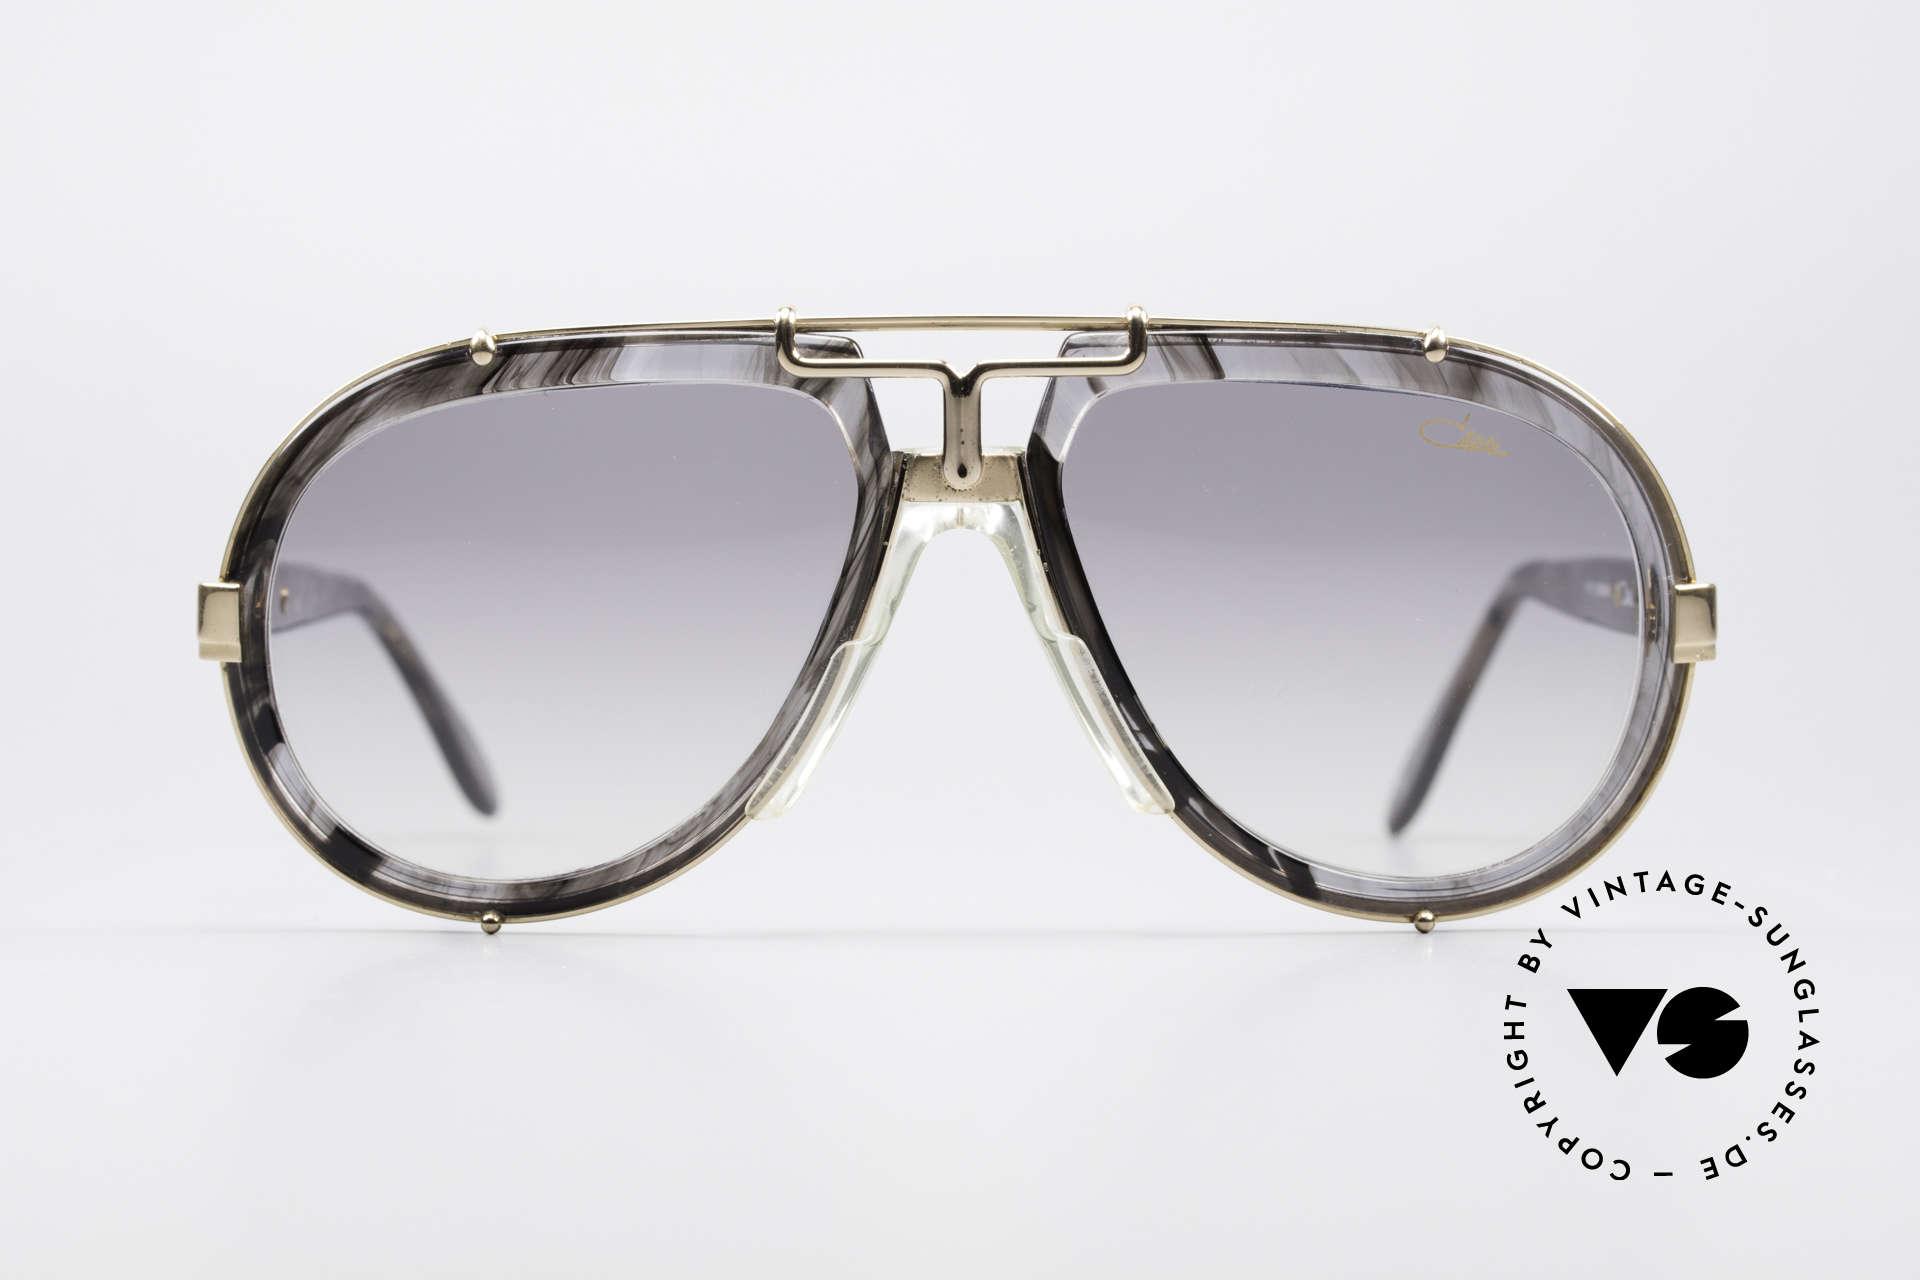 b3417bc3e93f Sunglasses Cazal 642 West Germany 80 s Original